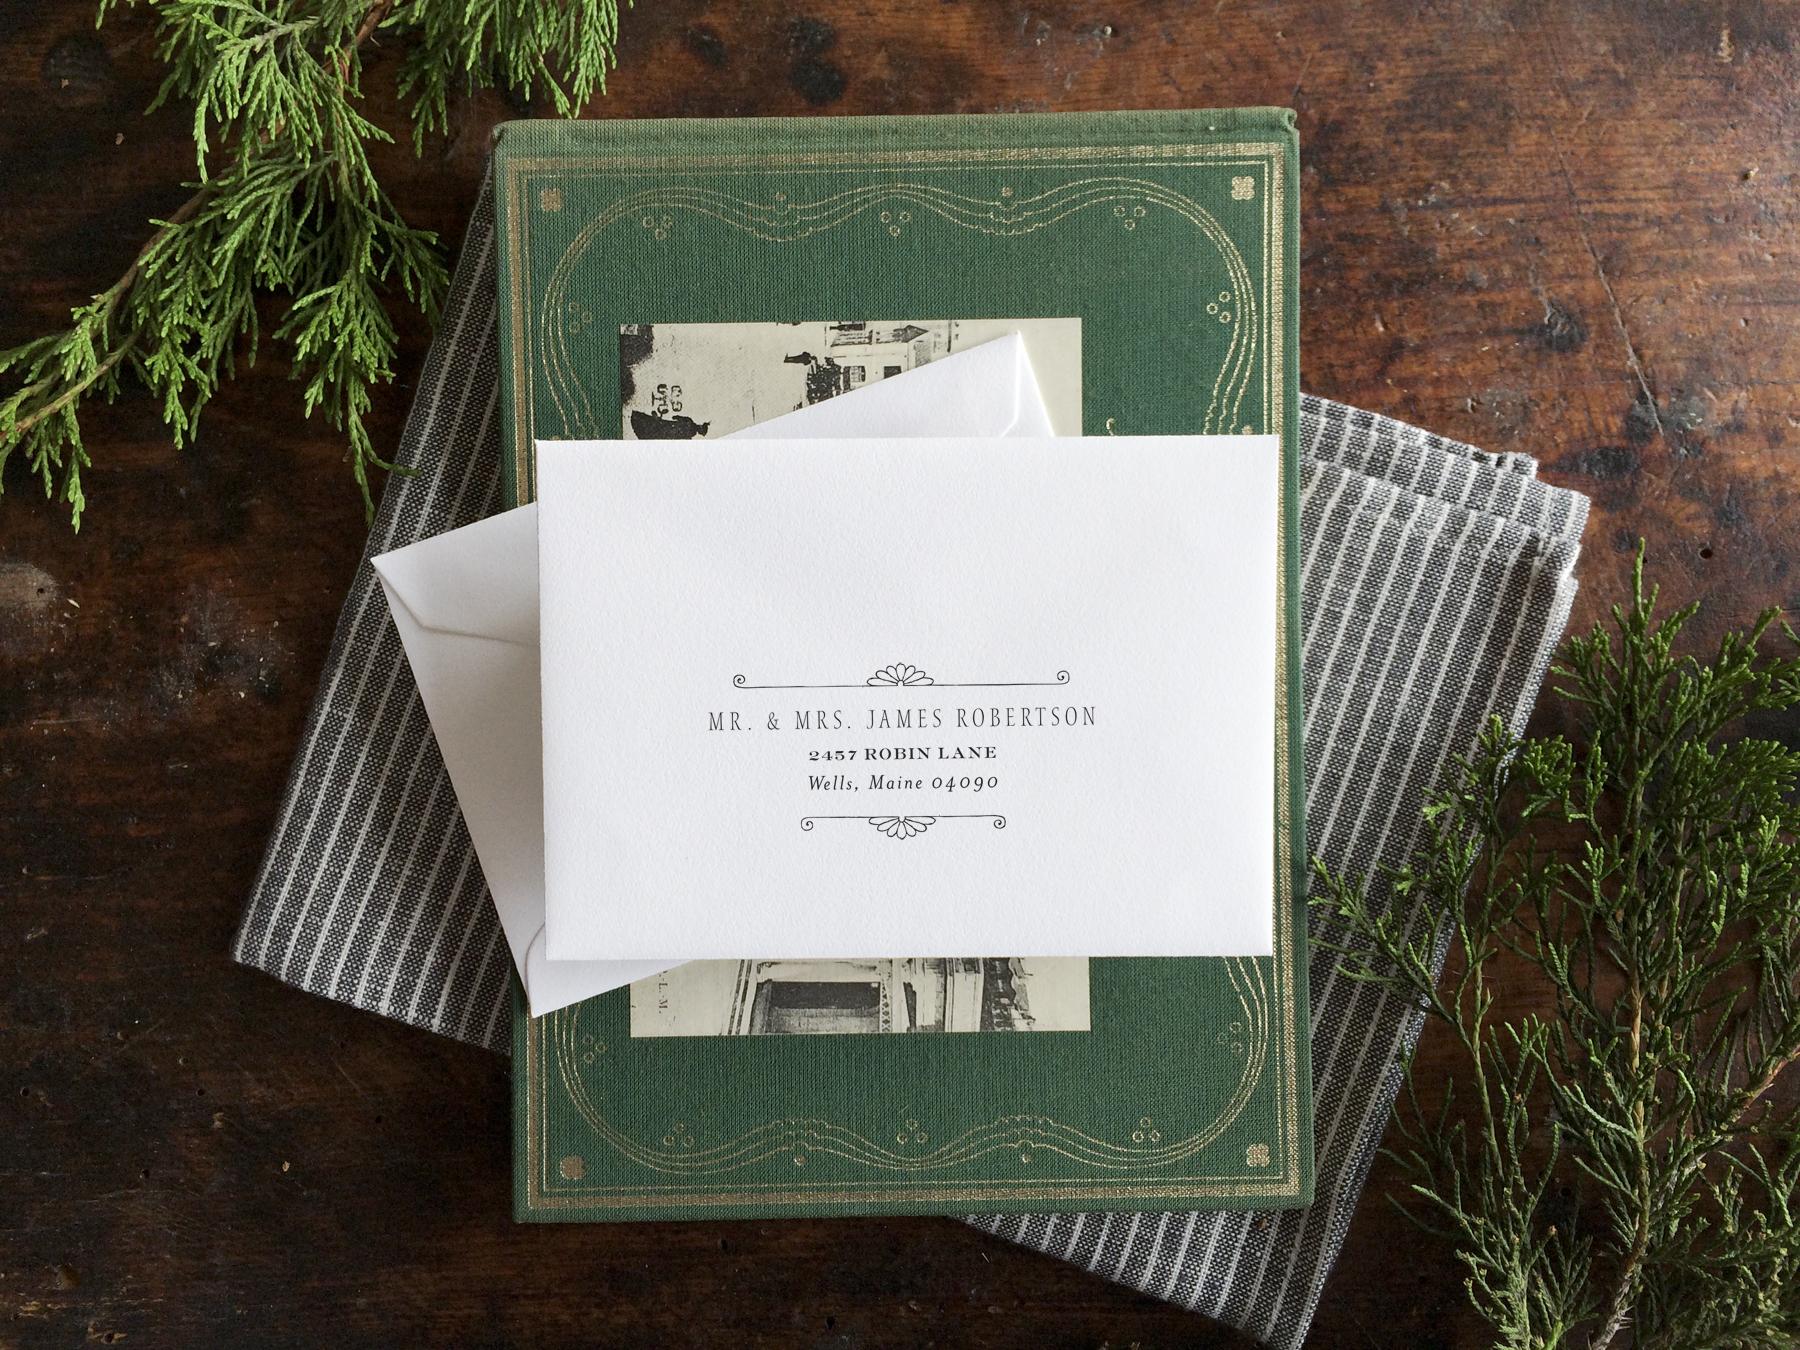 vintage-reply-envelope-address.jpg